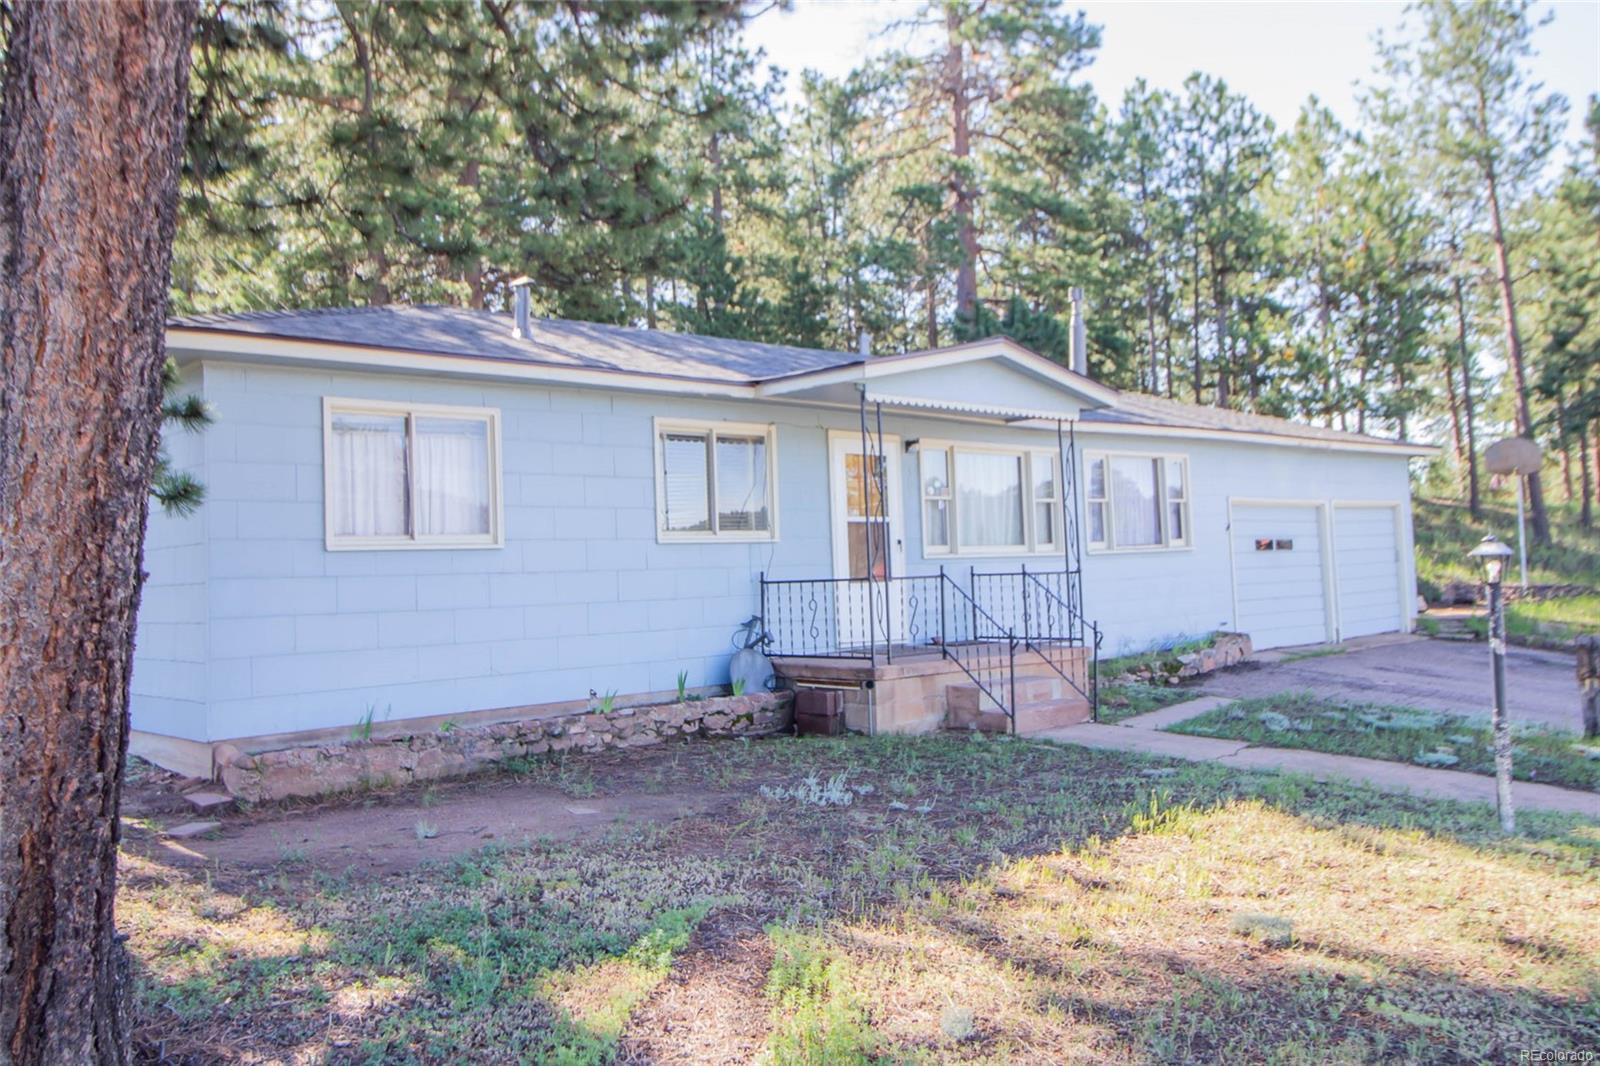 303 S Baldwin Street, Woodland Park, CO 80863 - Woodland Park, CO real estate listing